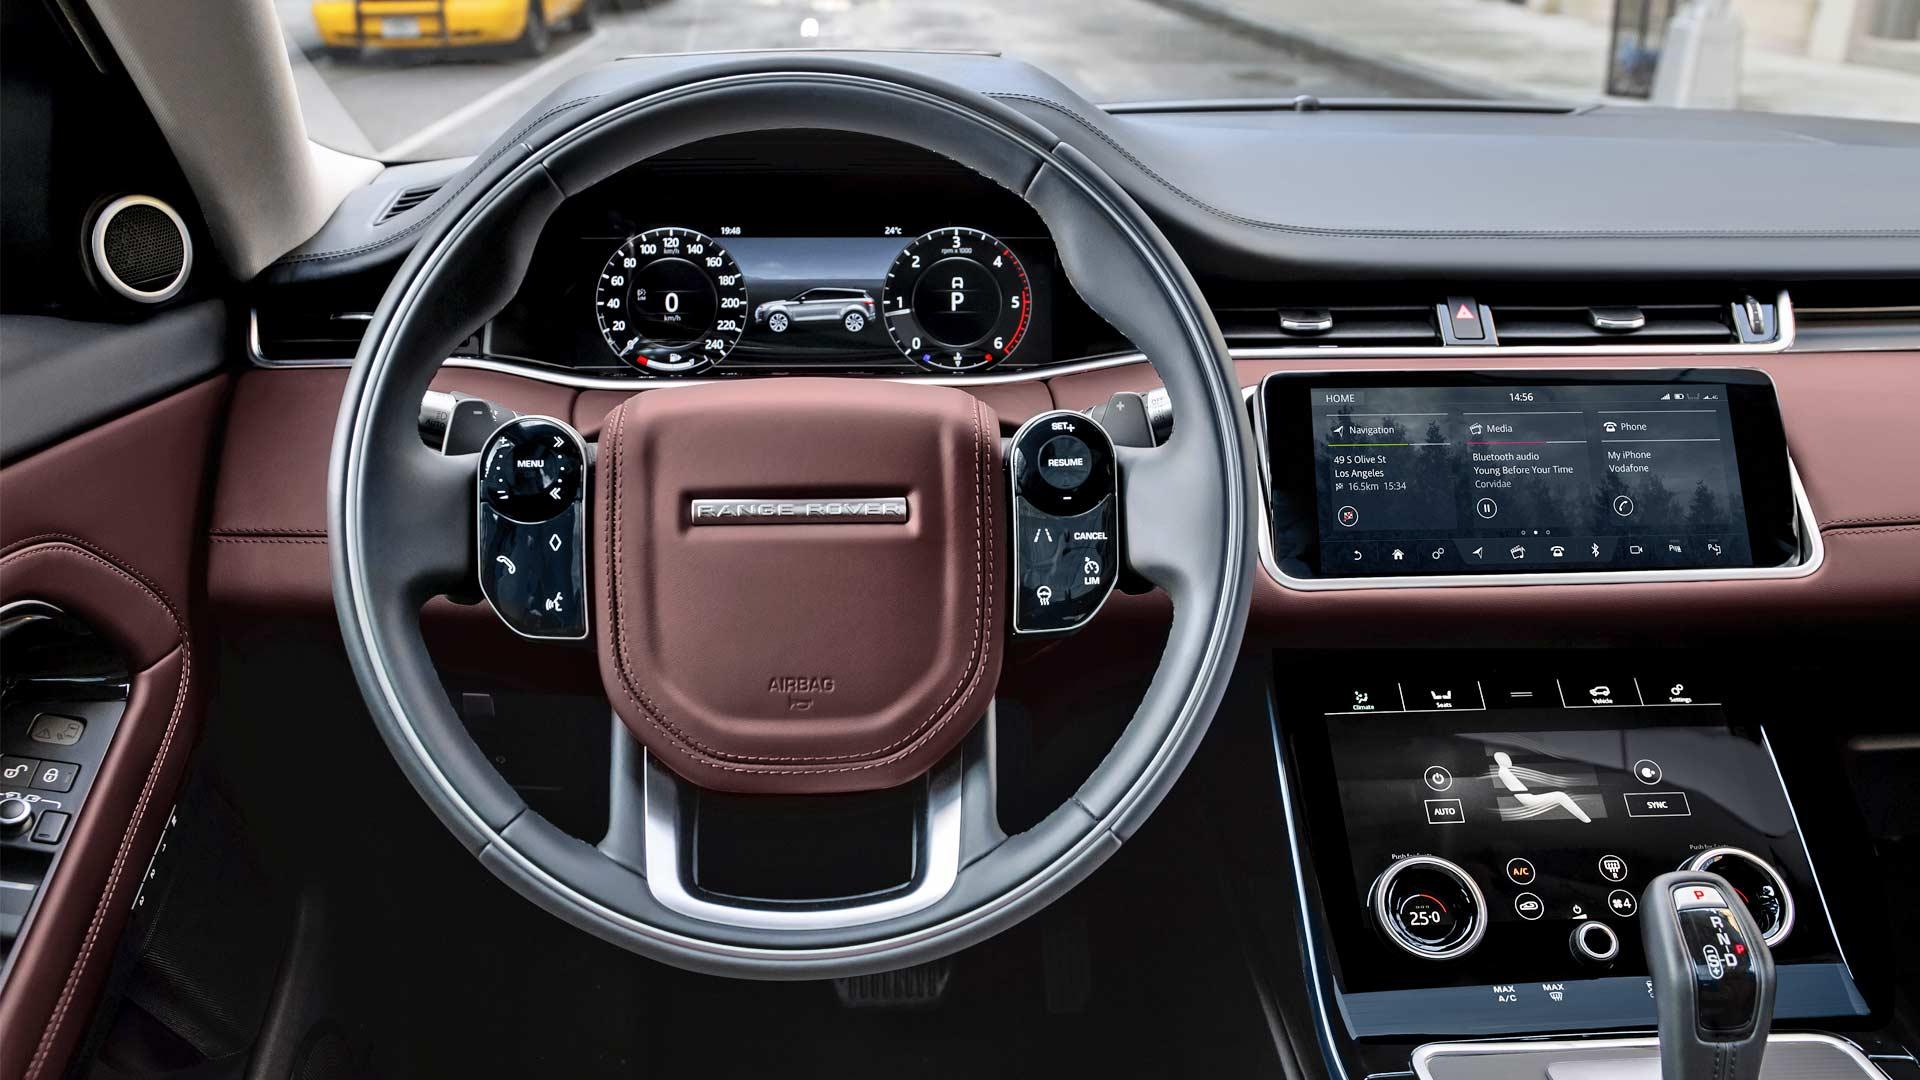 2020-Range-Rover-Evoque-Interior_2